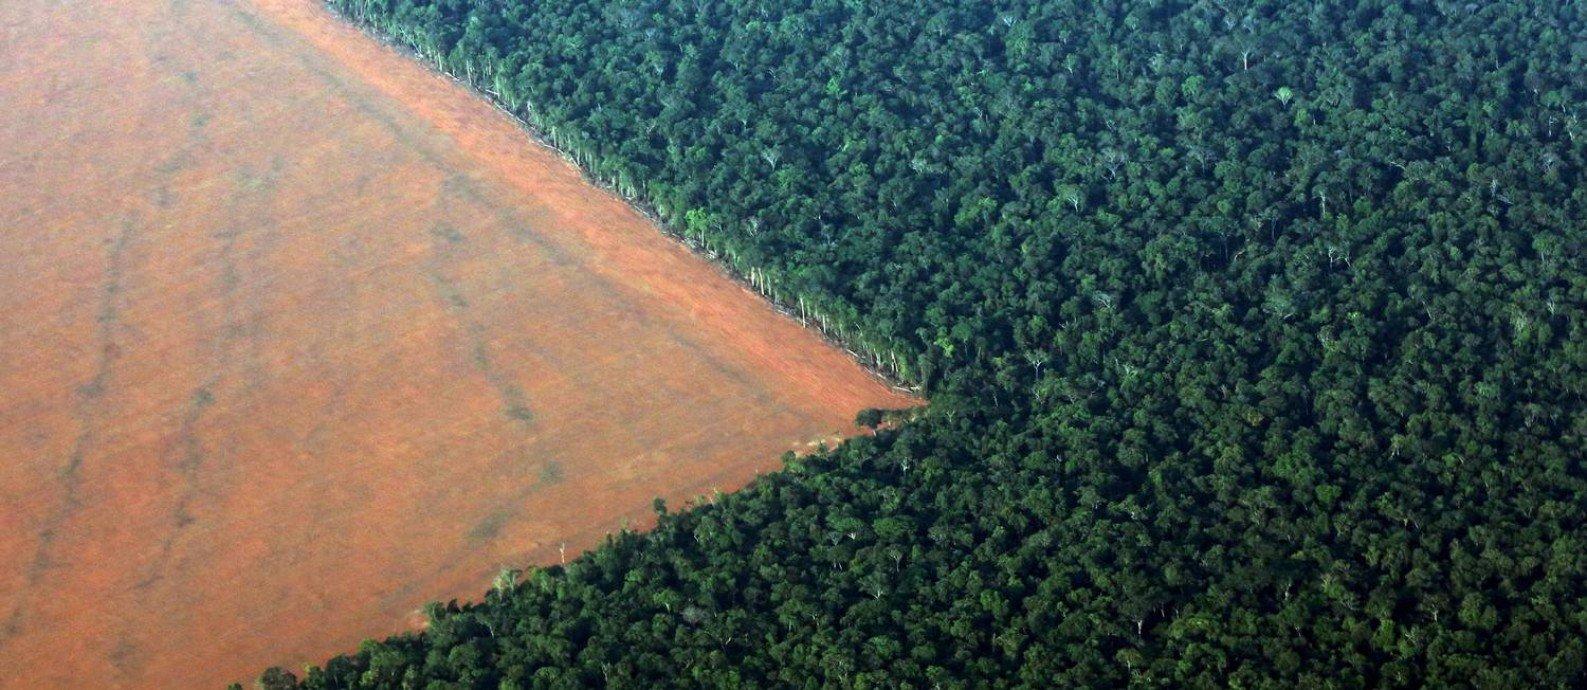 Trecho desmatado da floresta Amazônica.